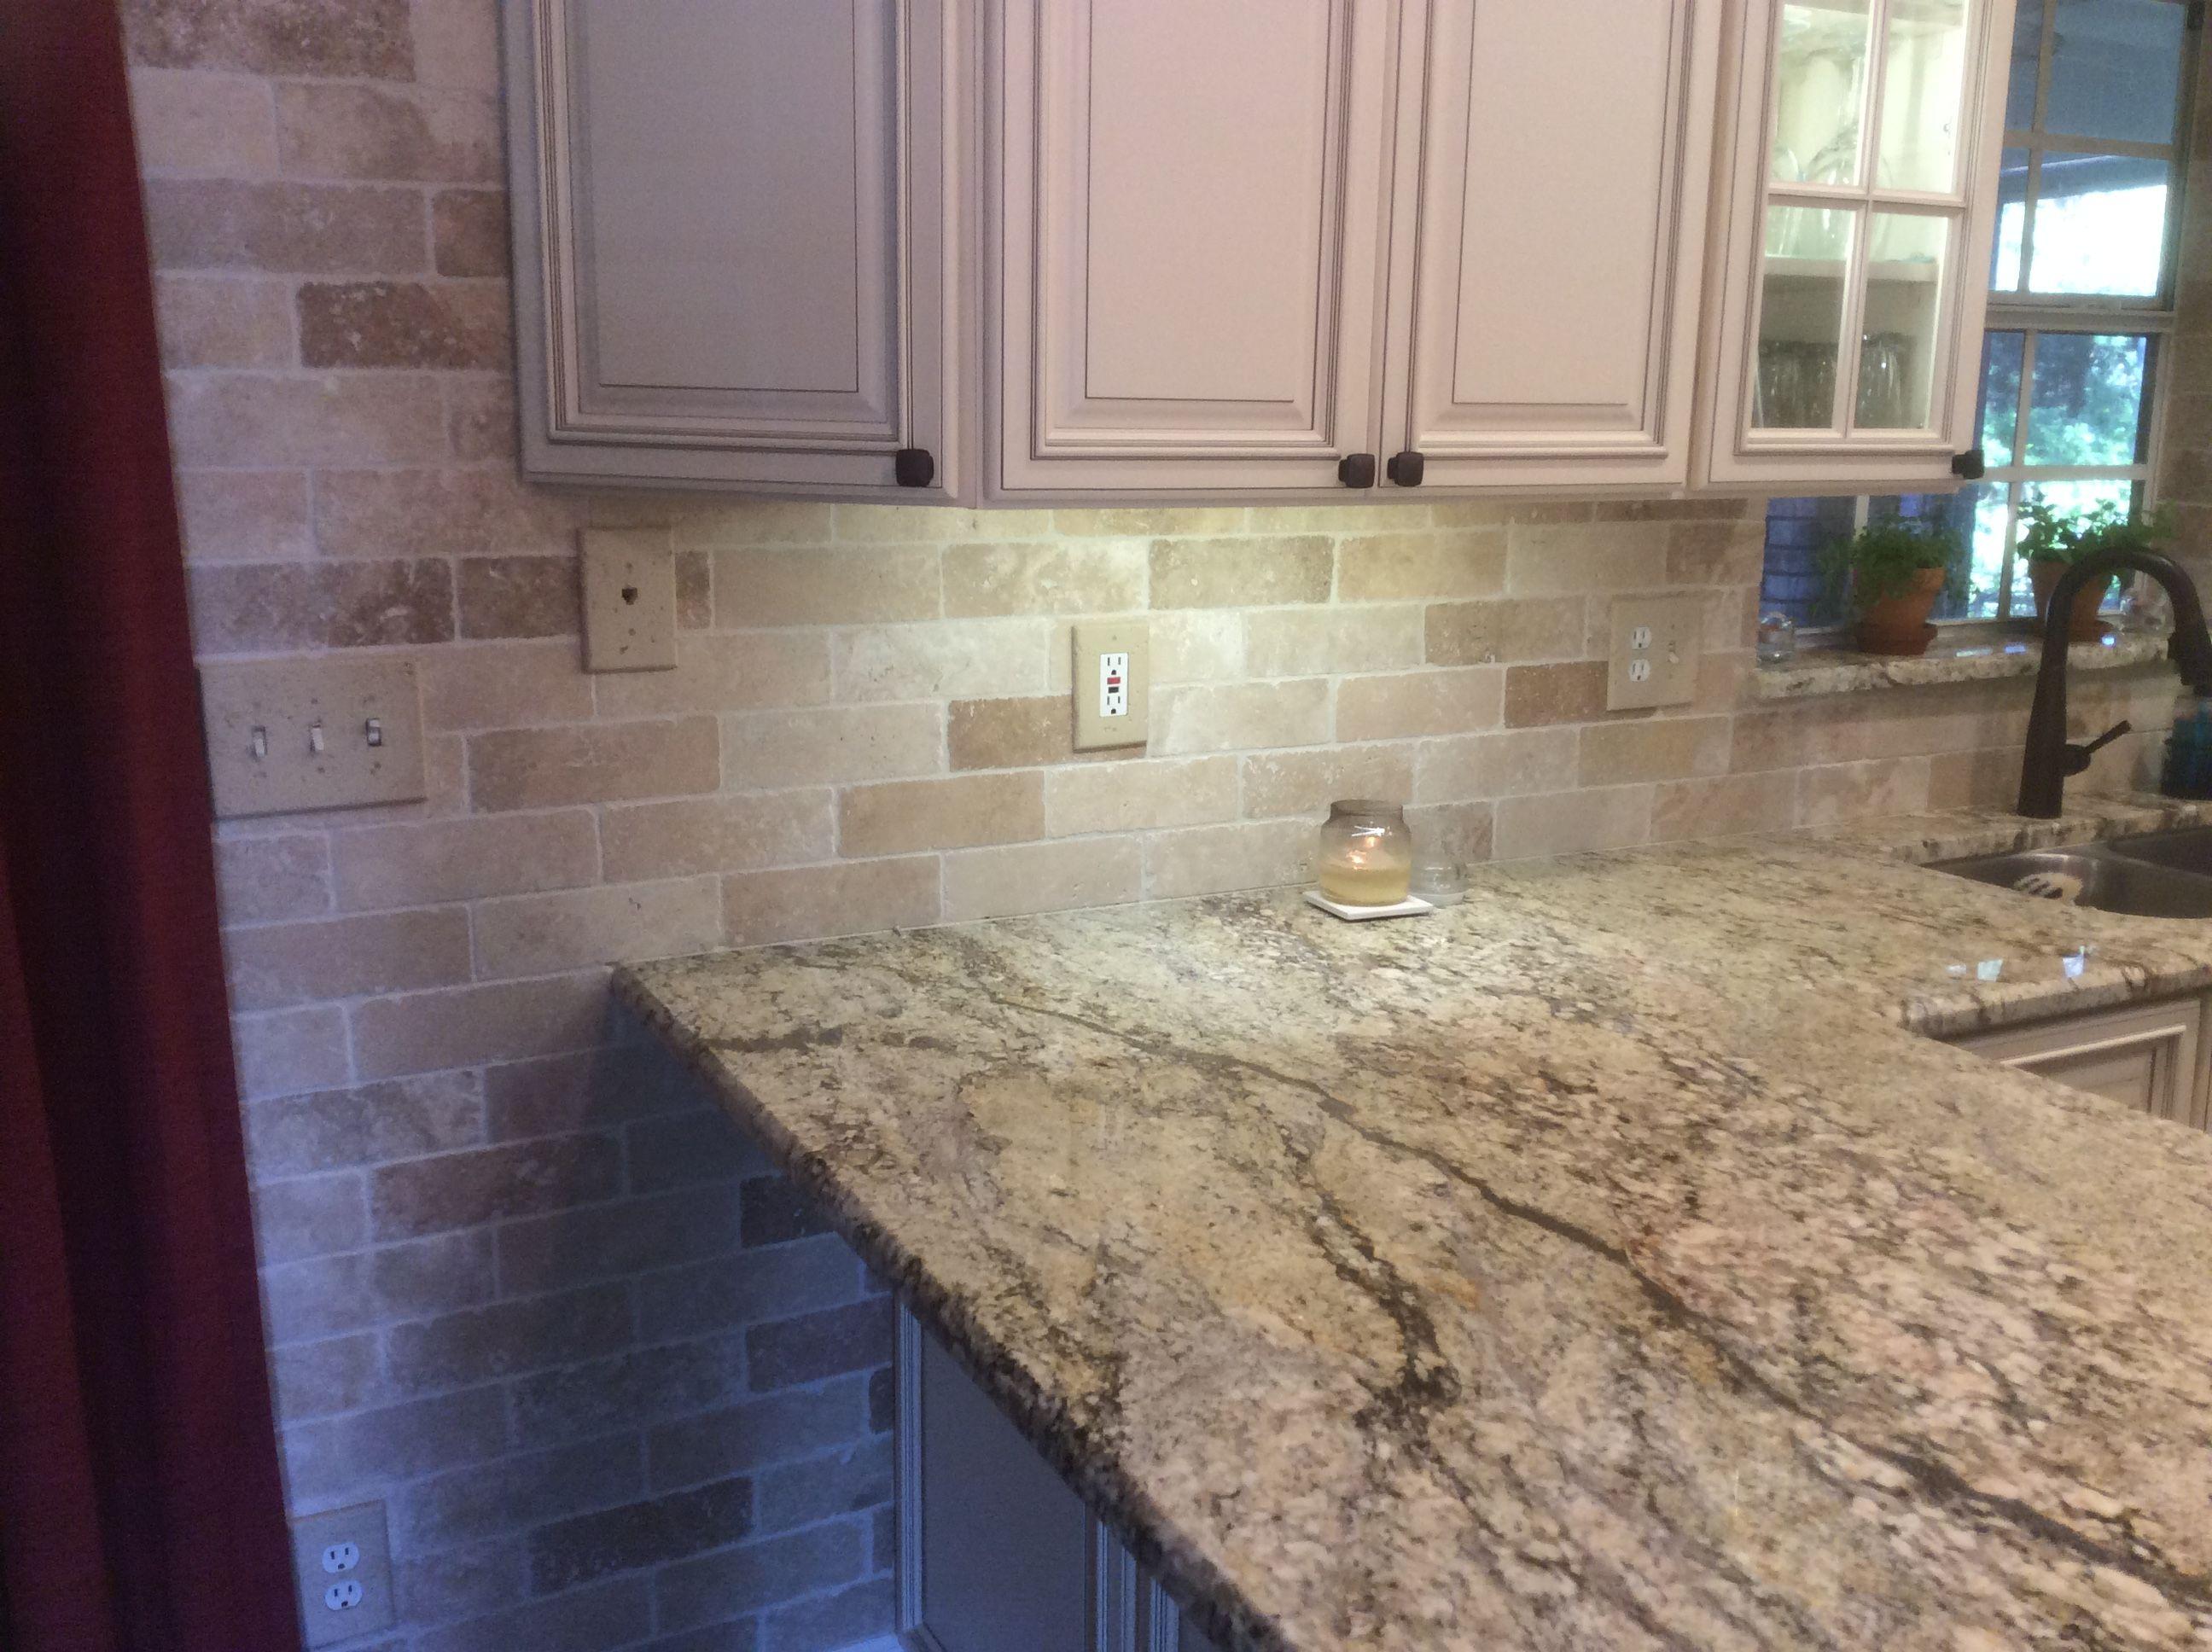 Forevermark Signature Pearl Cabinets Yellow River Granite And Travertine Backsplash Wall Metallic Backsplash Marble Backsplash Herringbone Backsplash